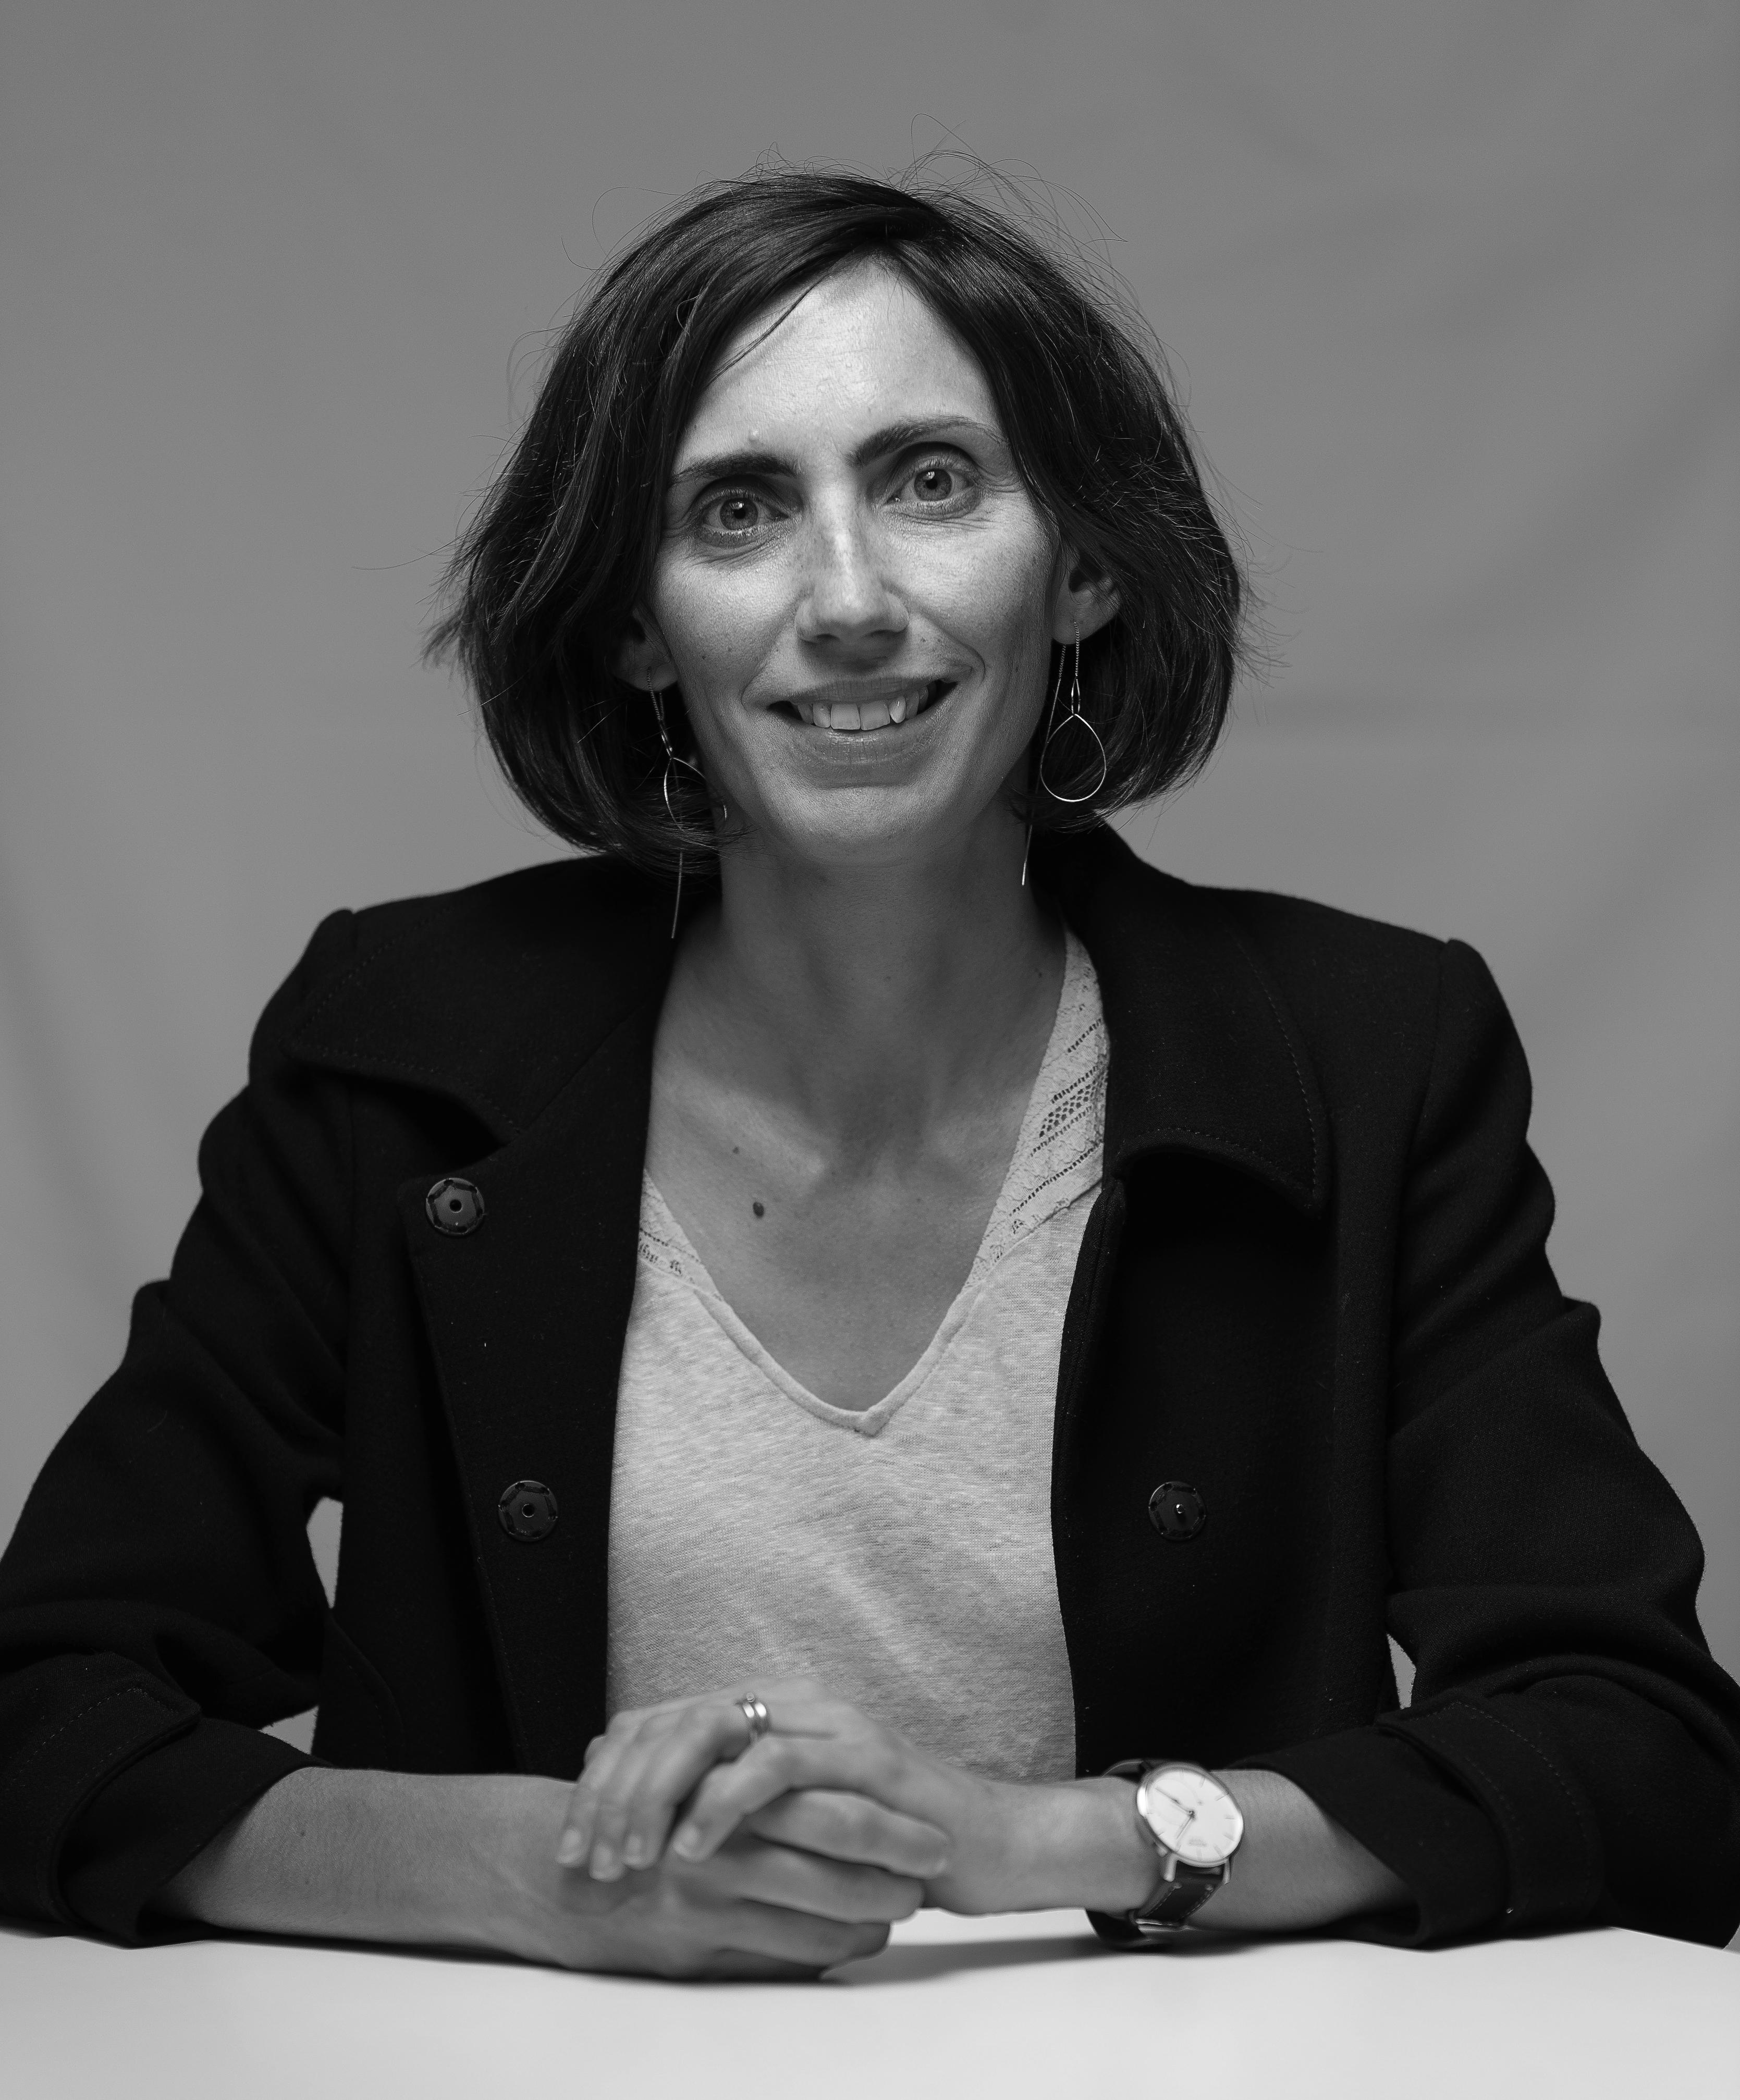 Sophie Echenim